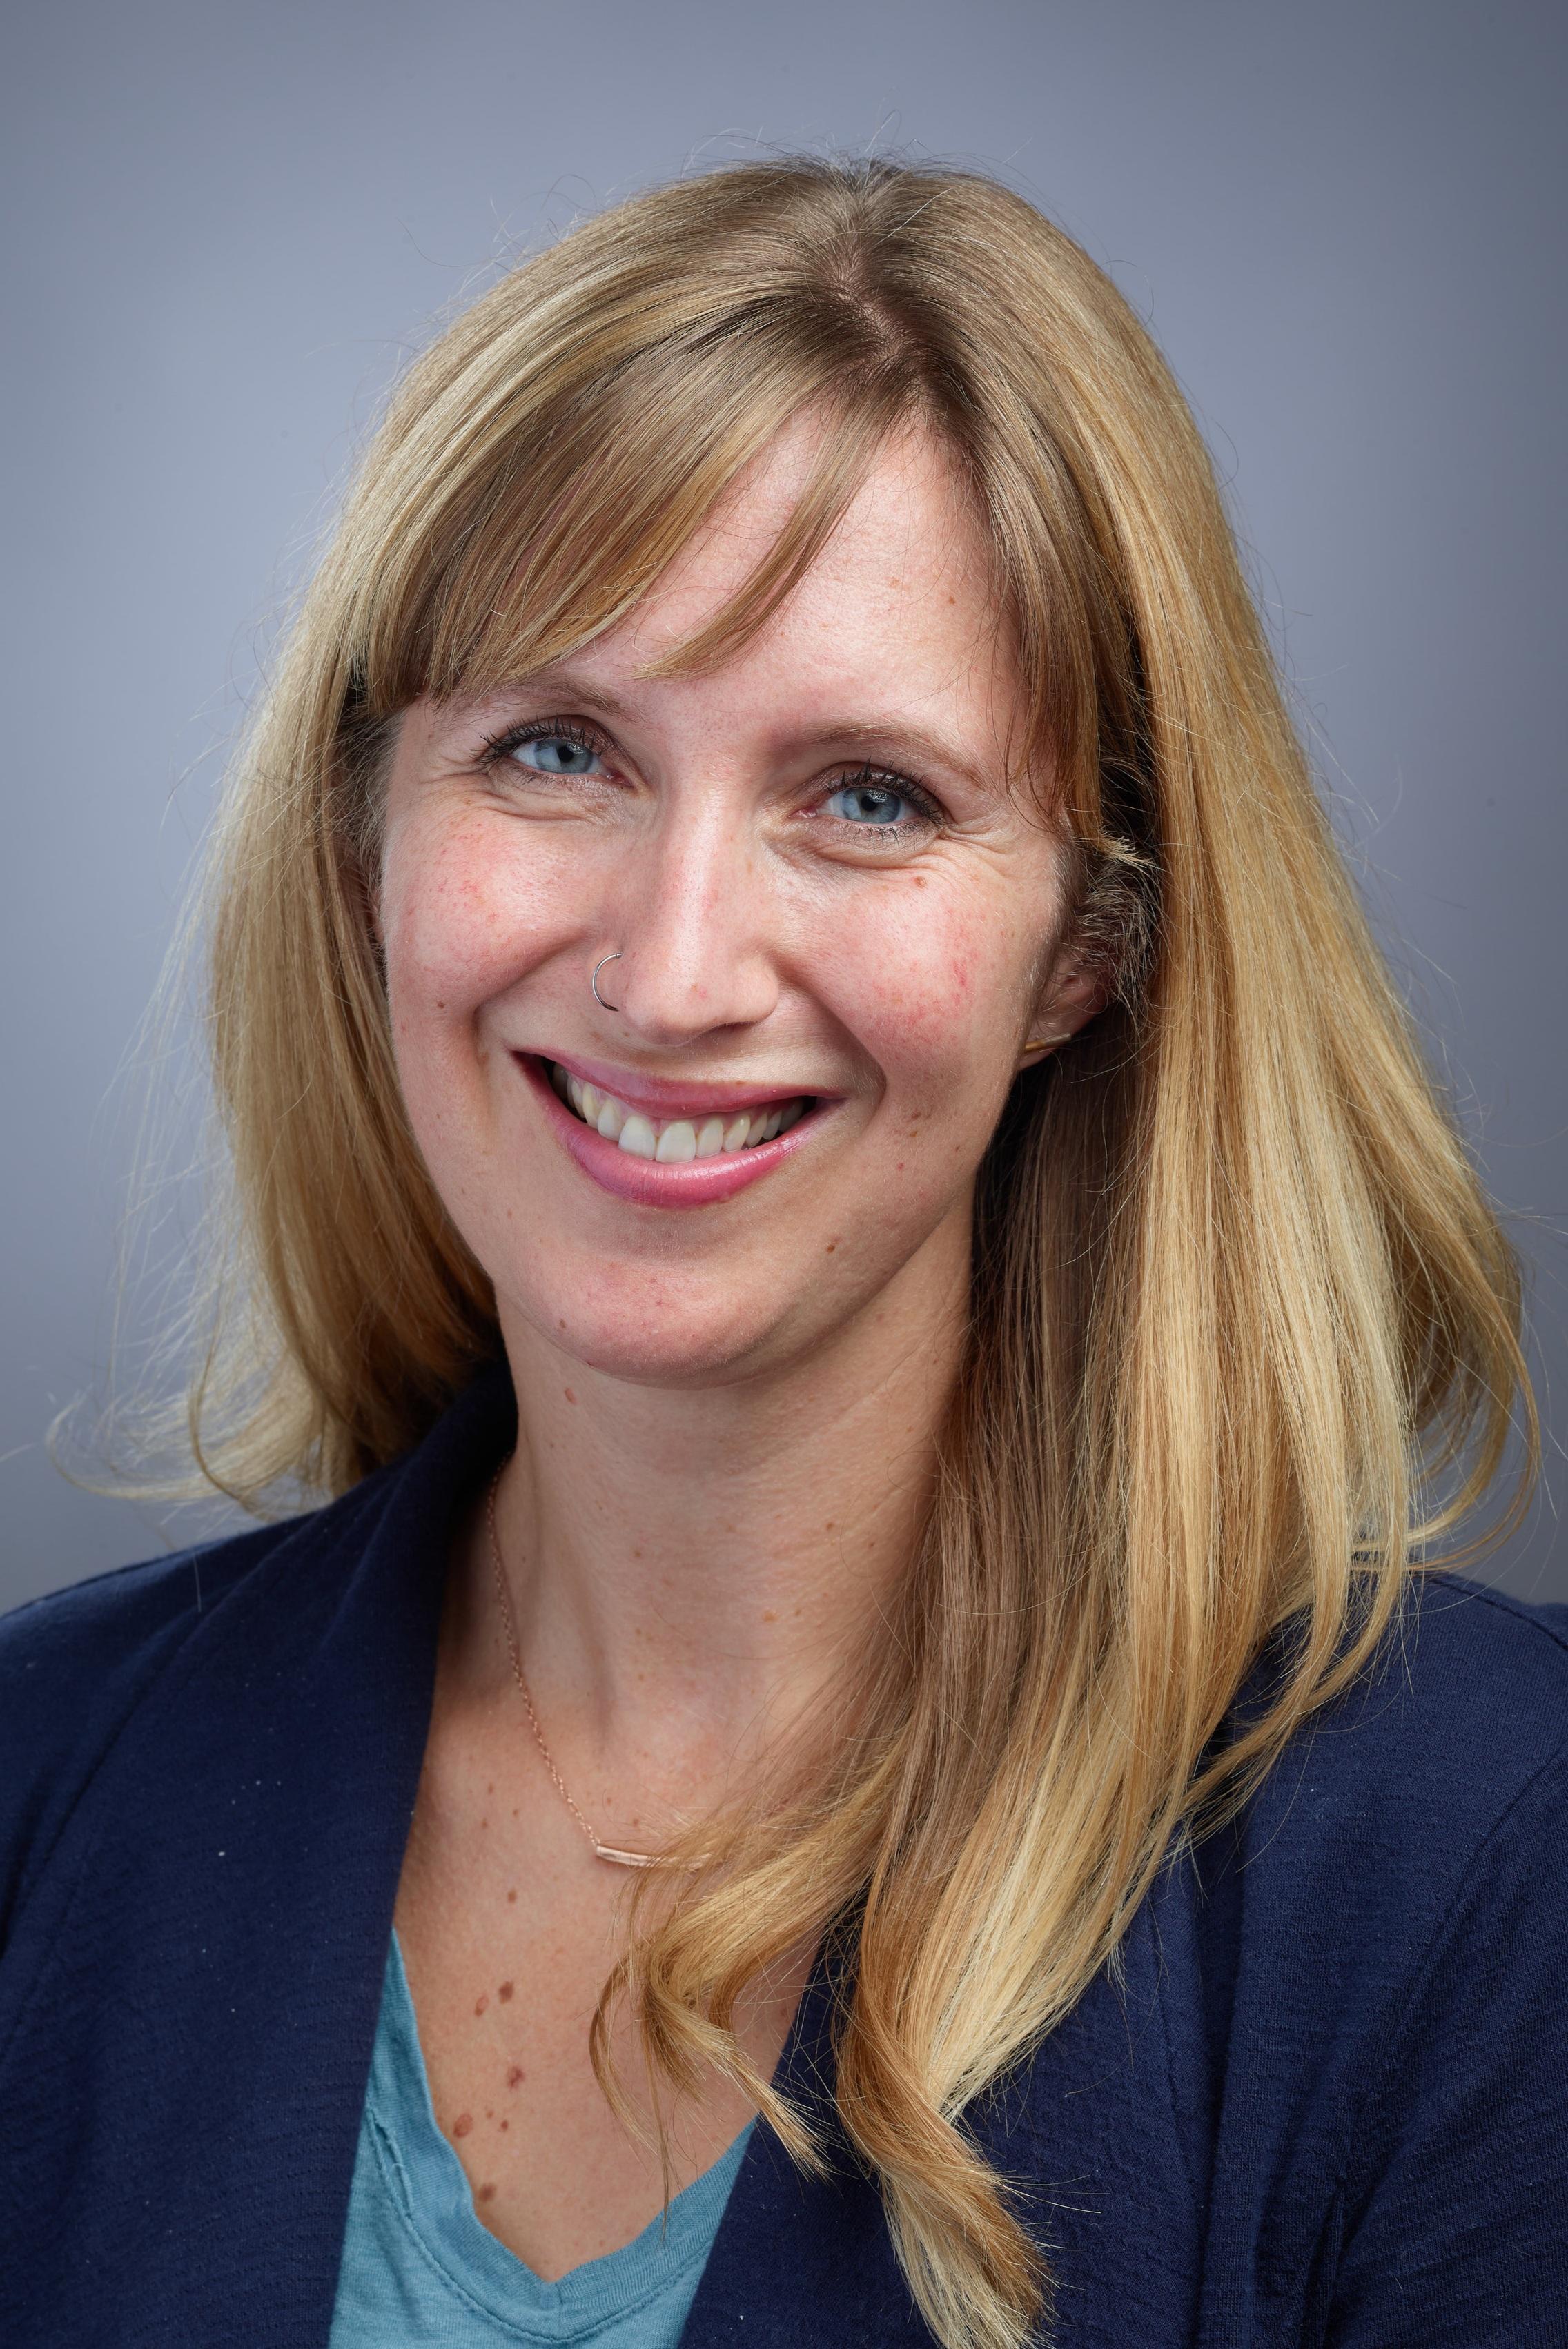 Margot Strauhull, LCSW, PMH-C